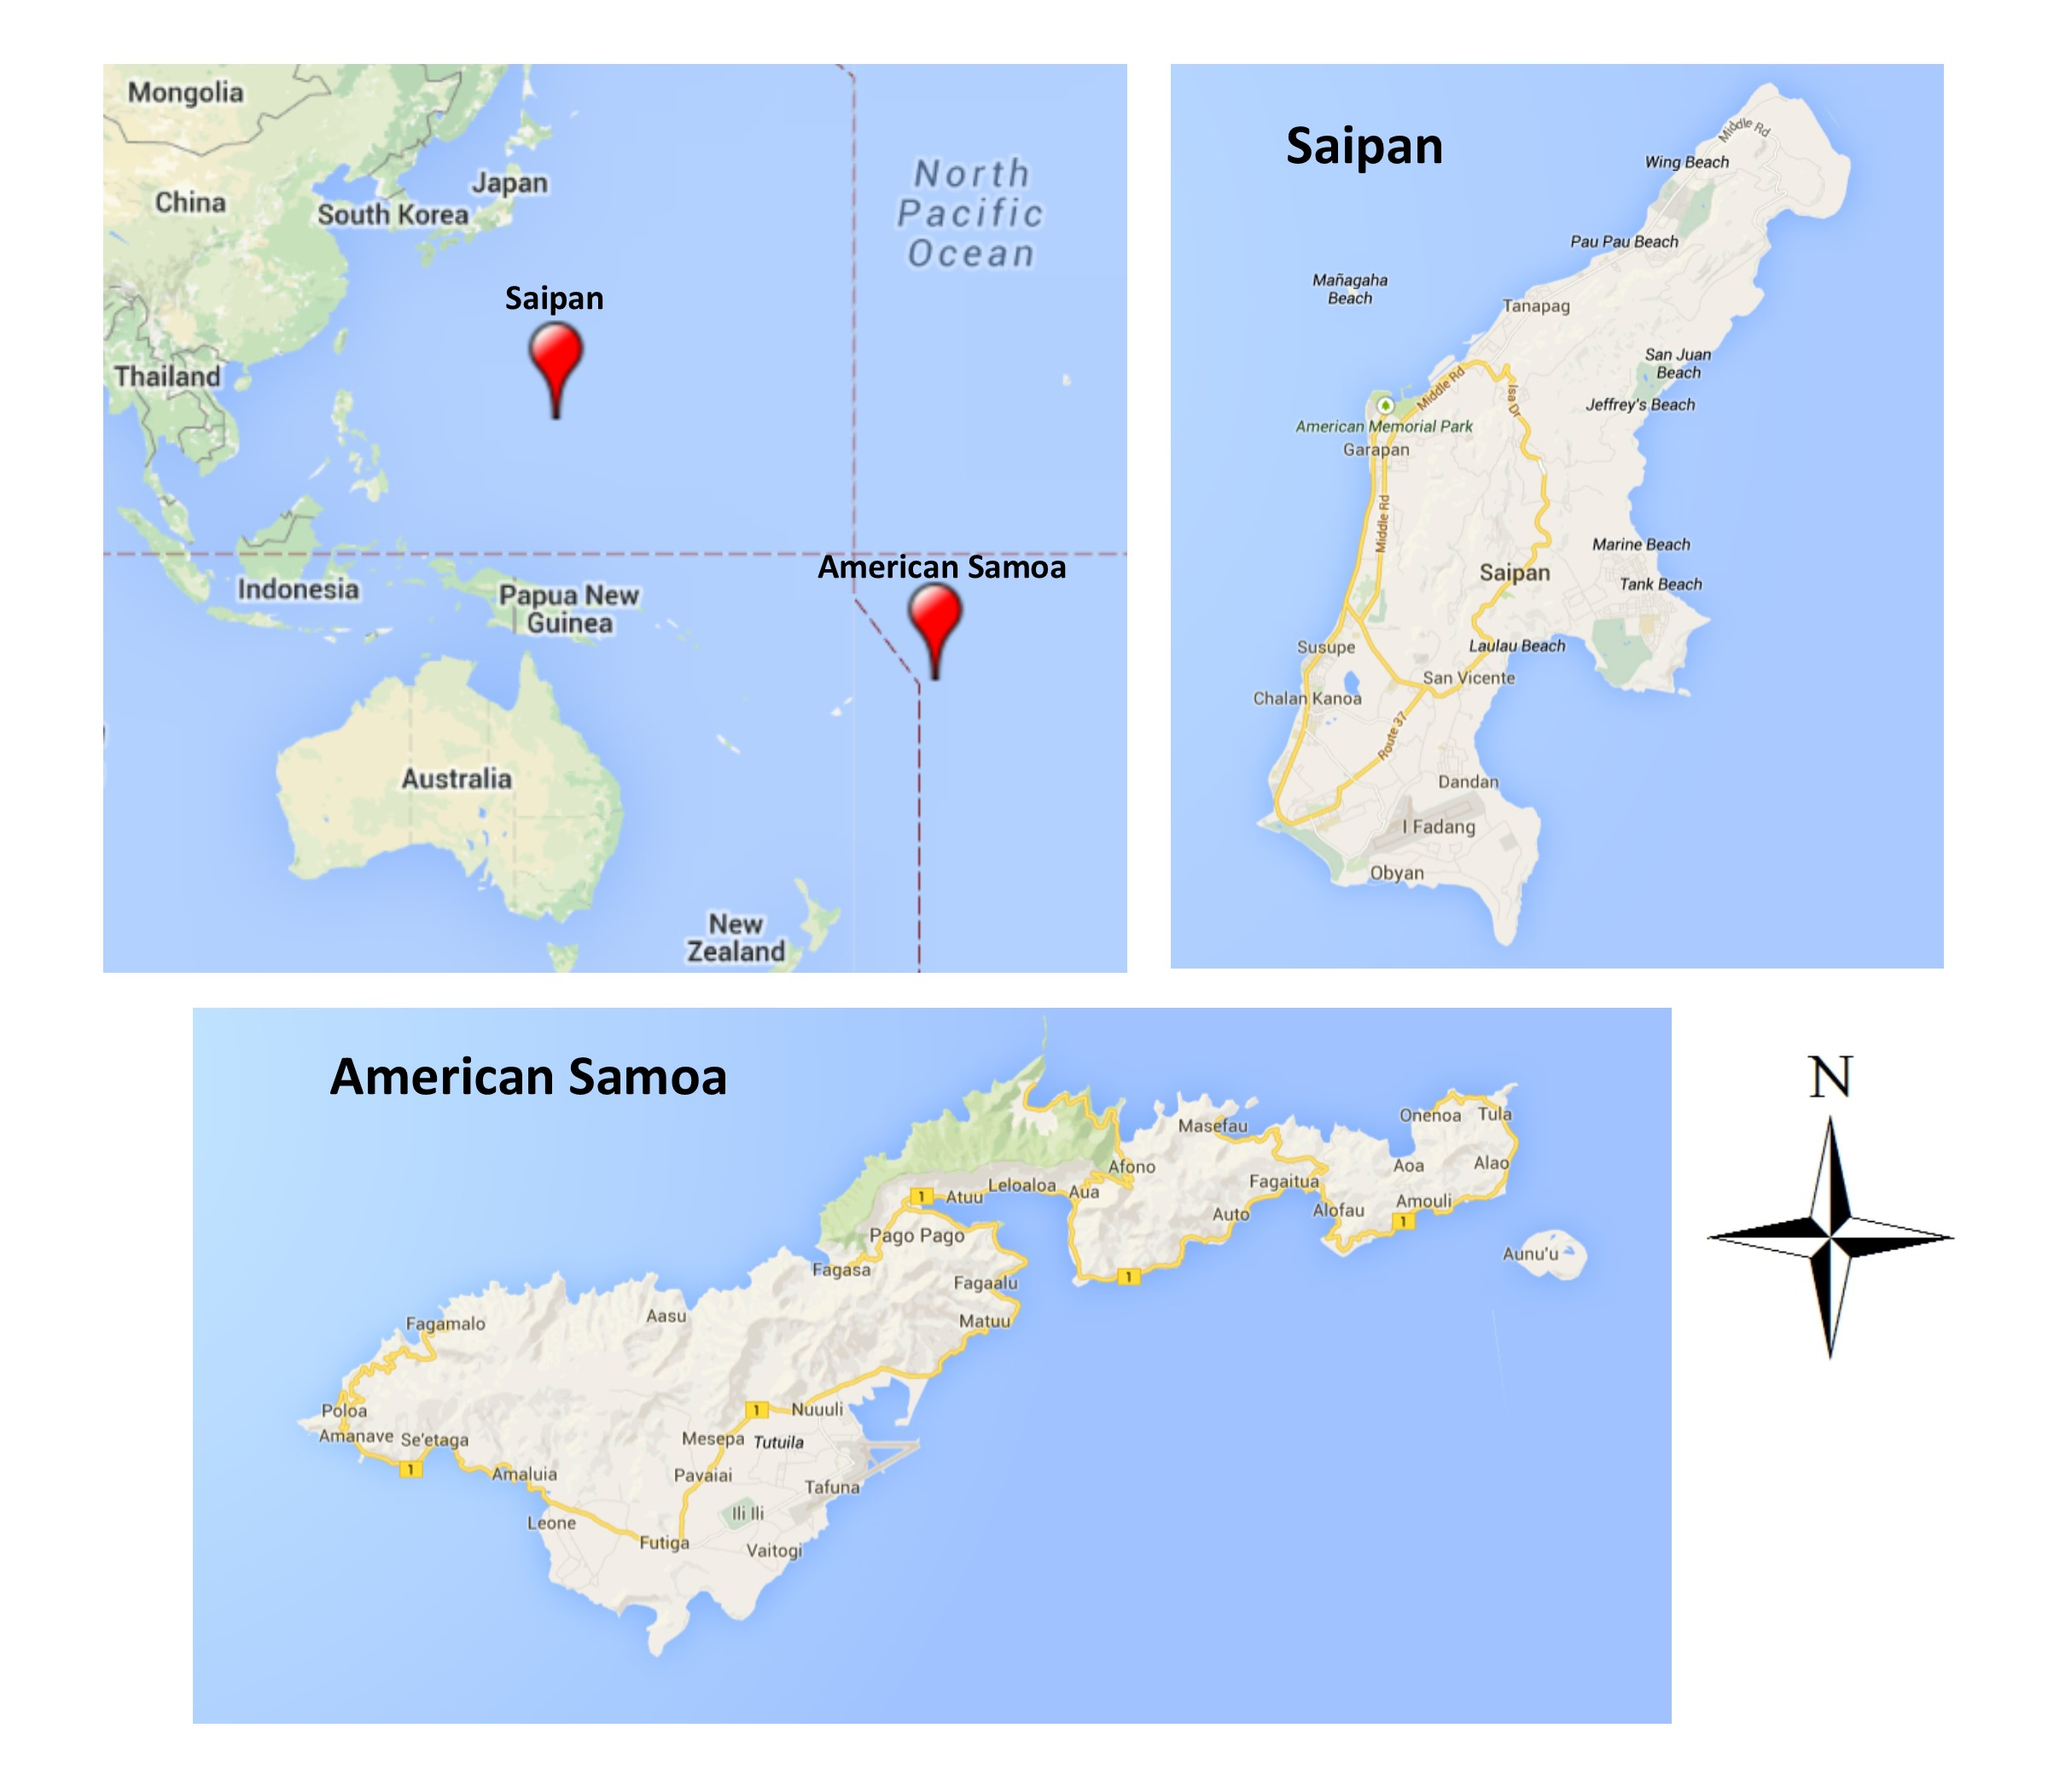 IBP Landbirds Of Saipan And American Samoa - Map of pacific northwest usa